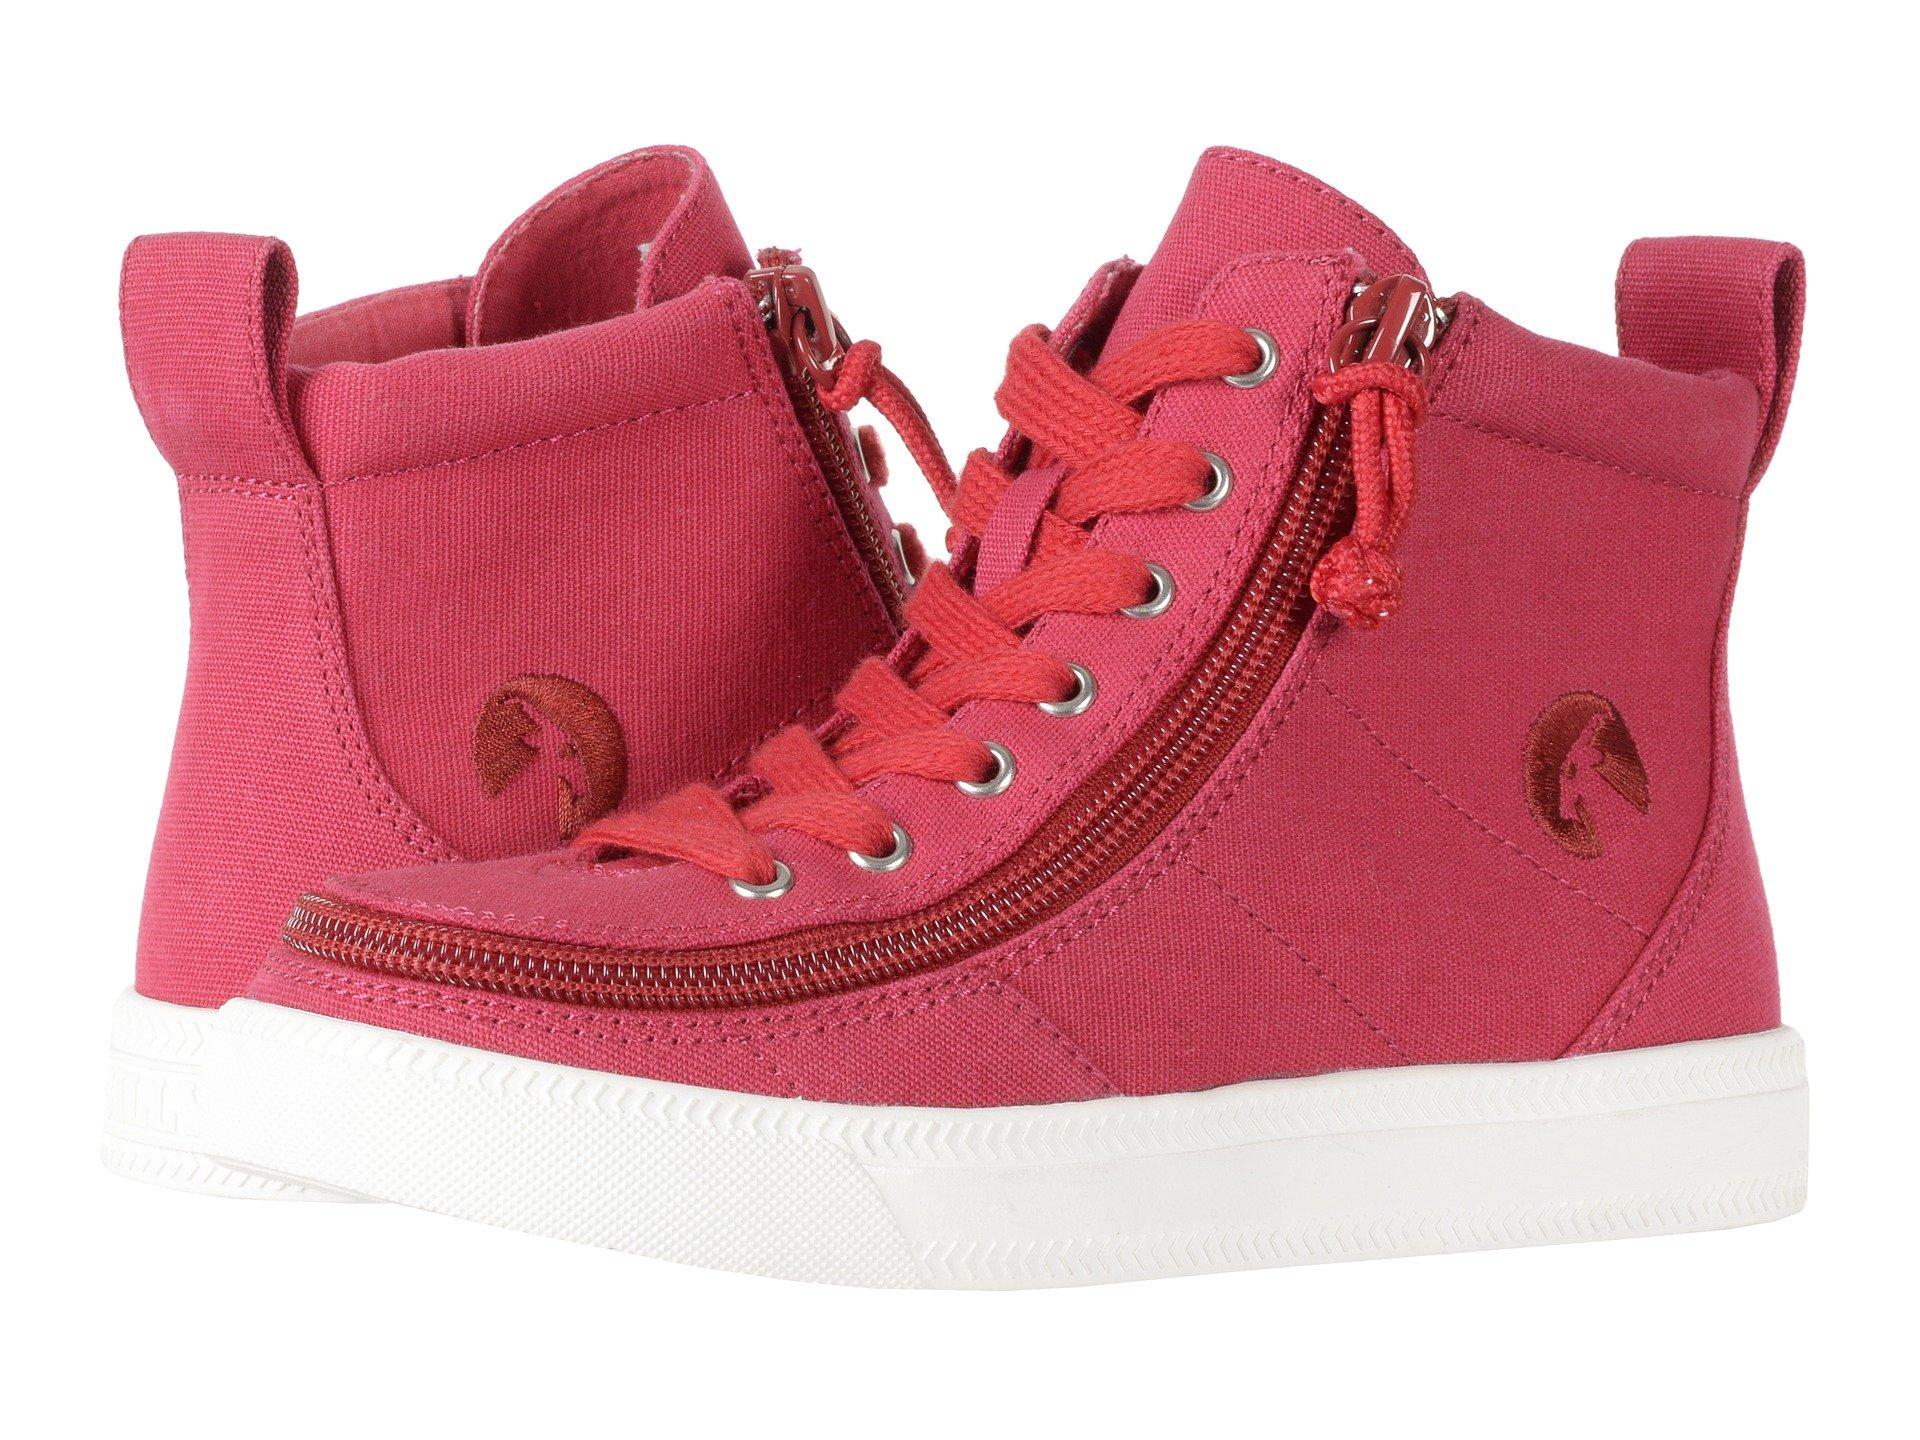 H M Kids Shoes Girls